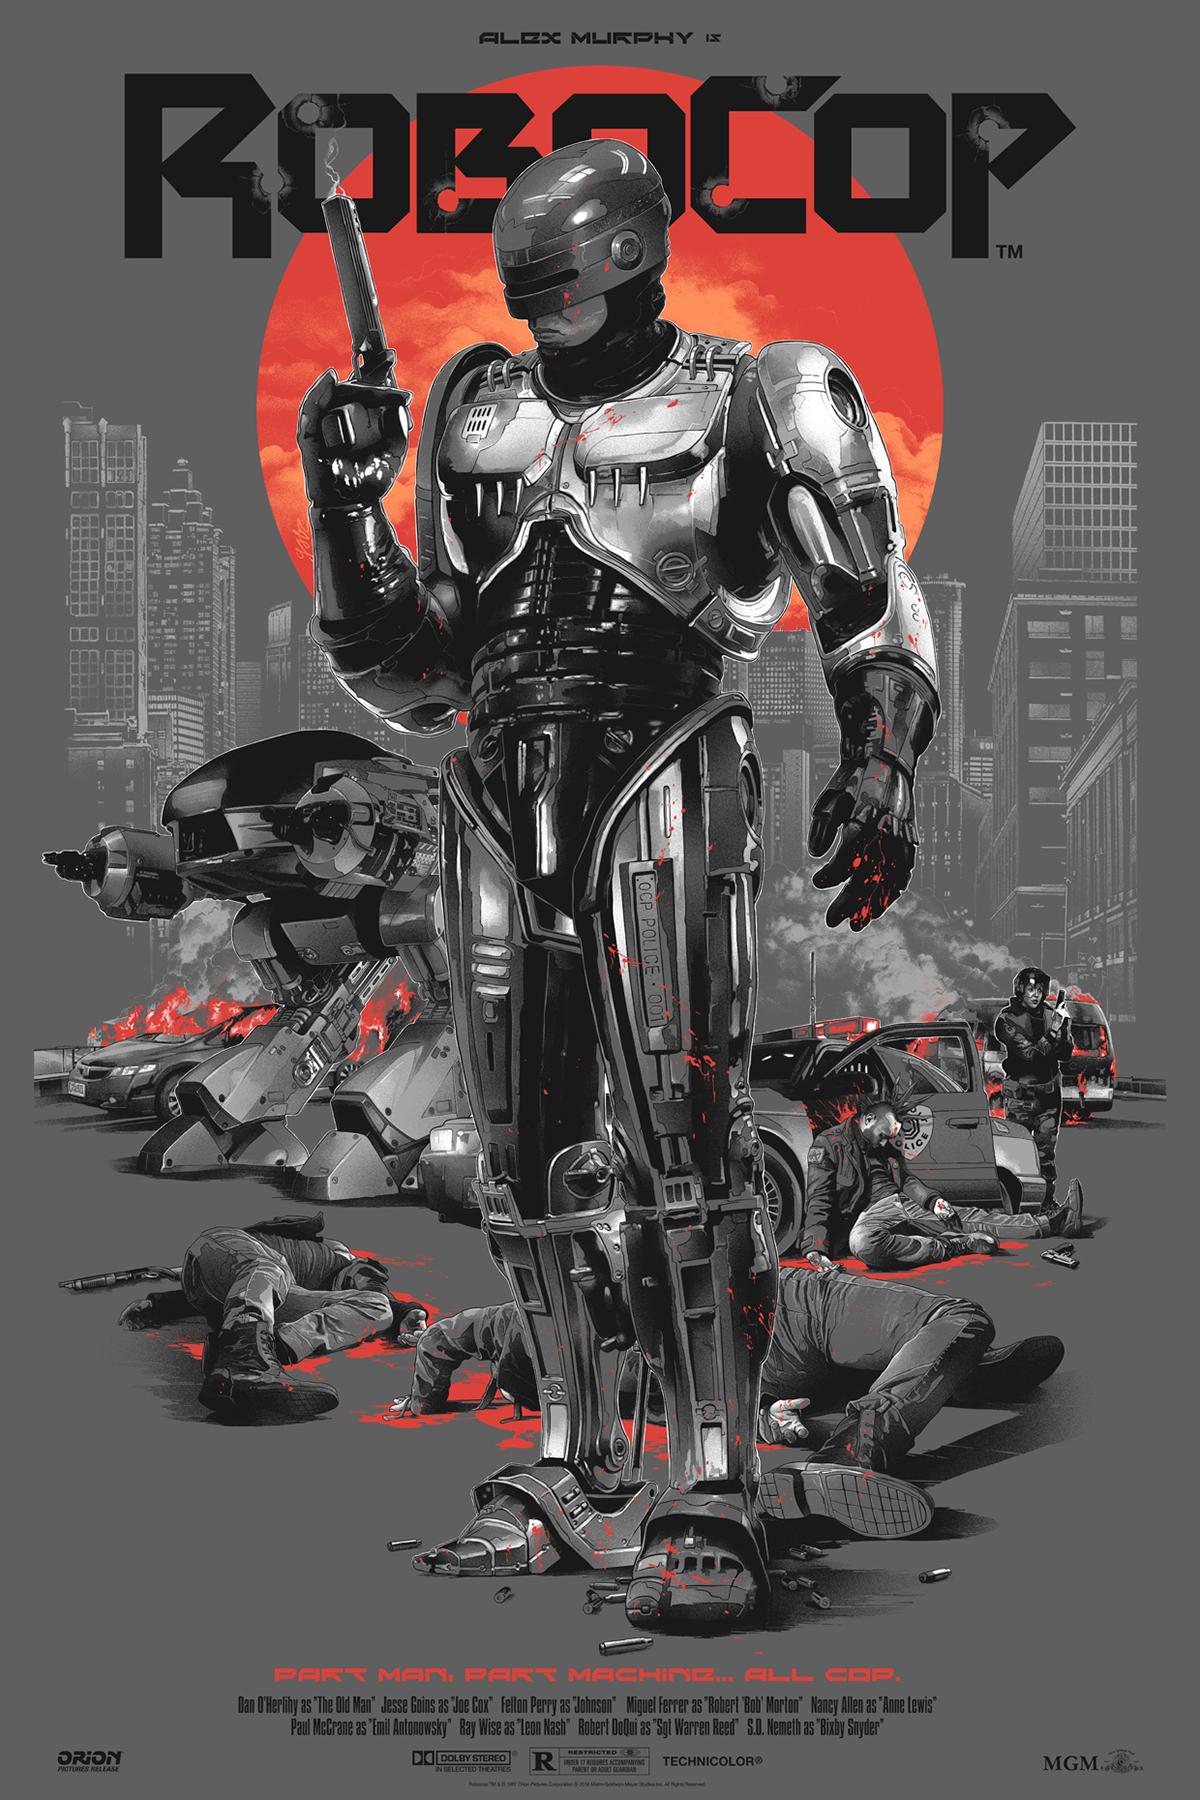 poster Gabz Grzegorz Domaradzki movie screen print Enter the dragon robocop Rocky bruce lee Sylvester Stallone